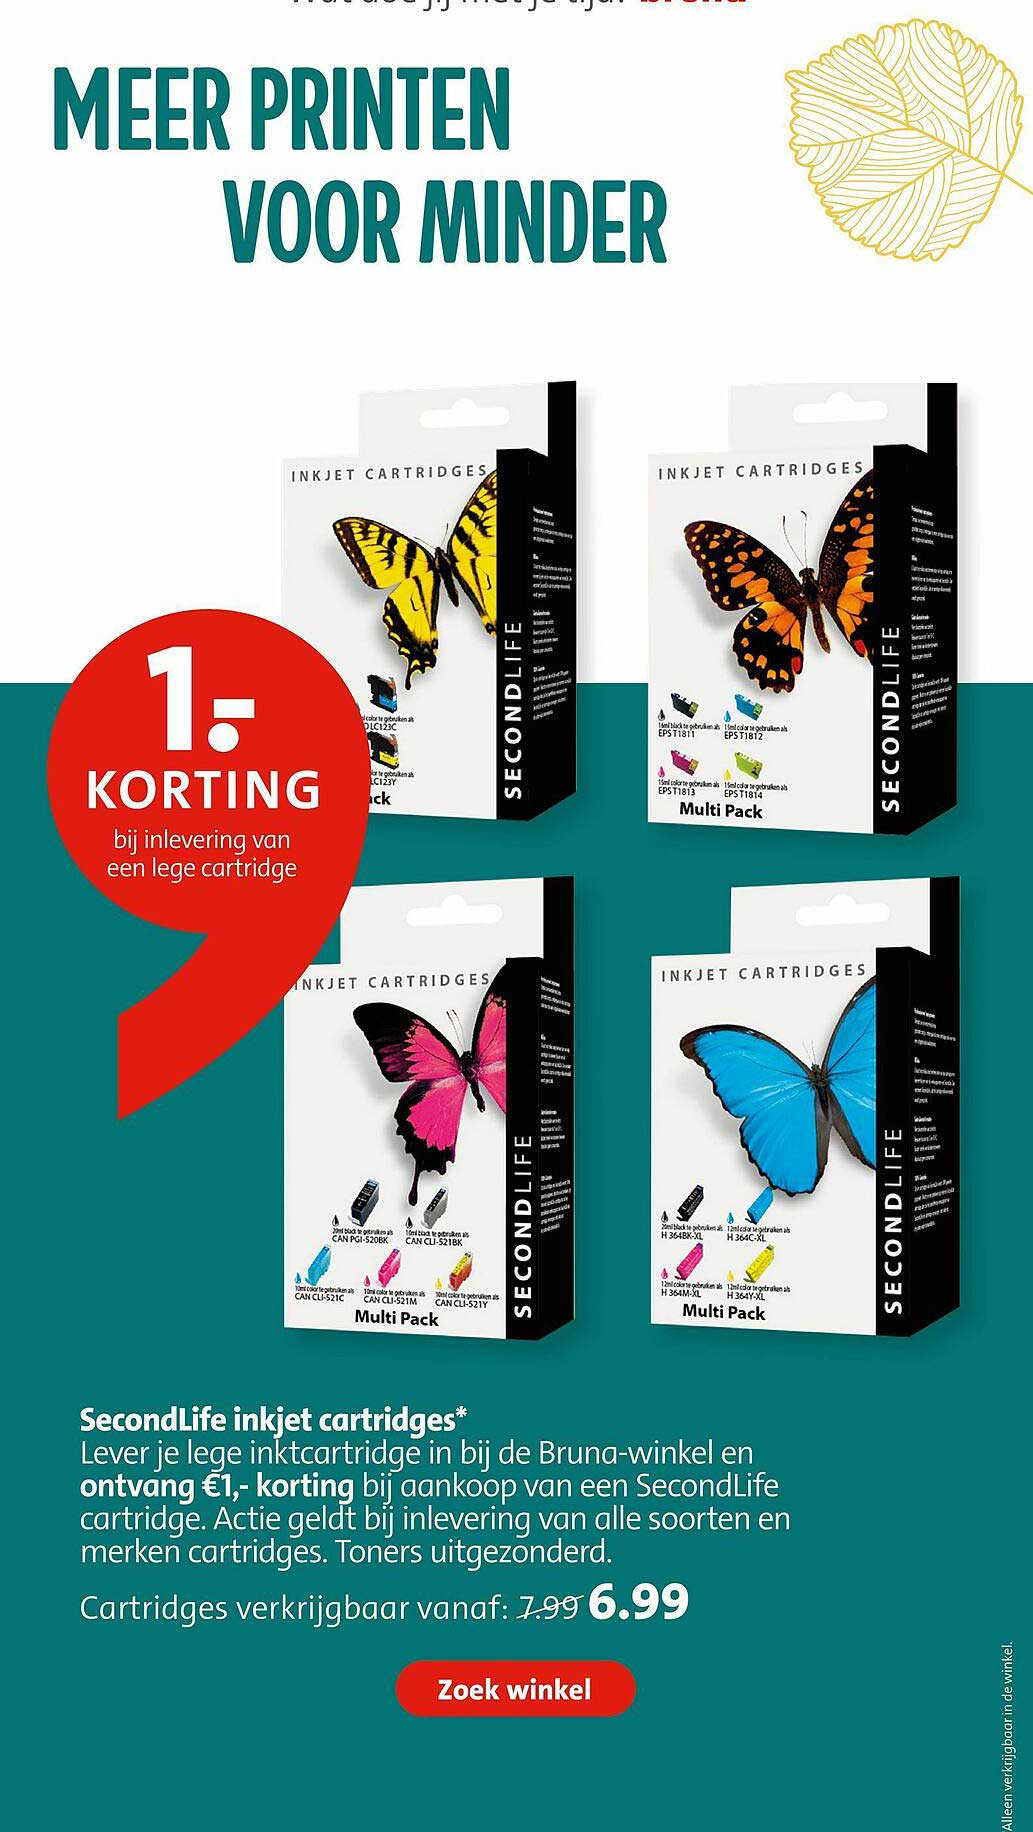 Bruna SecondLife Inkjet Cartridges*